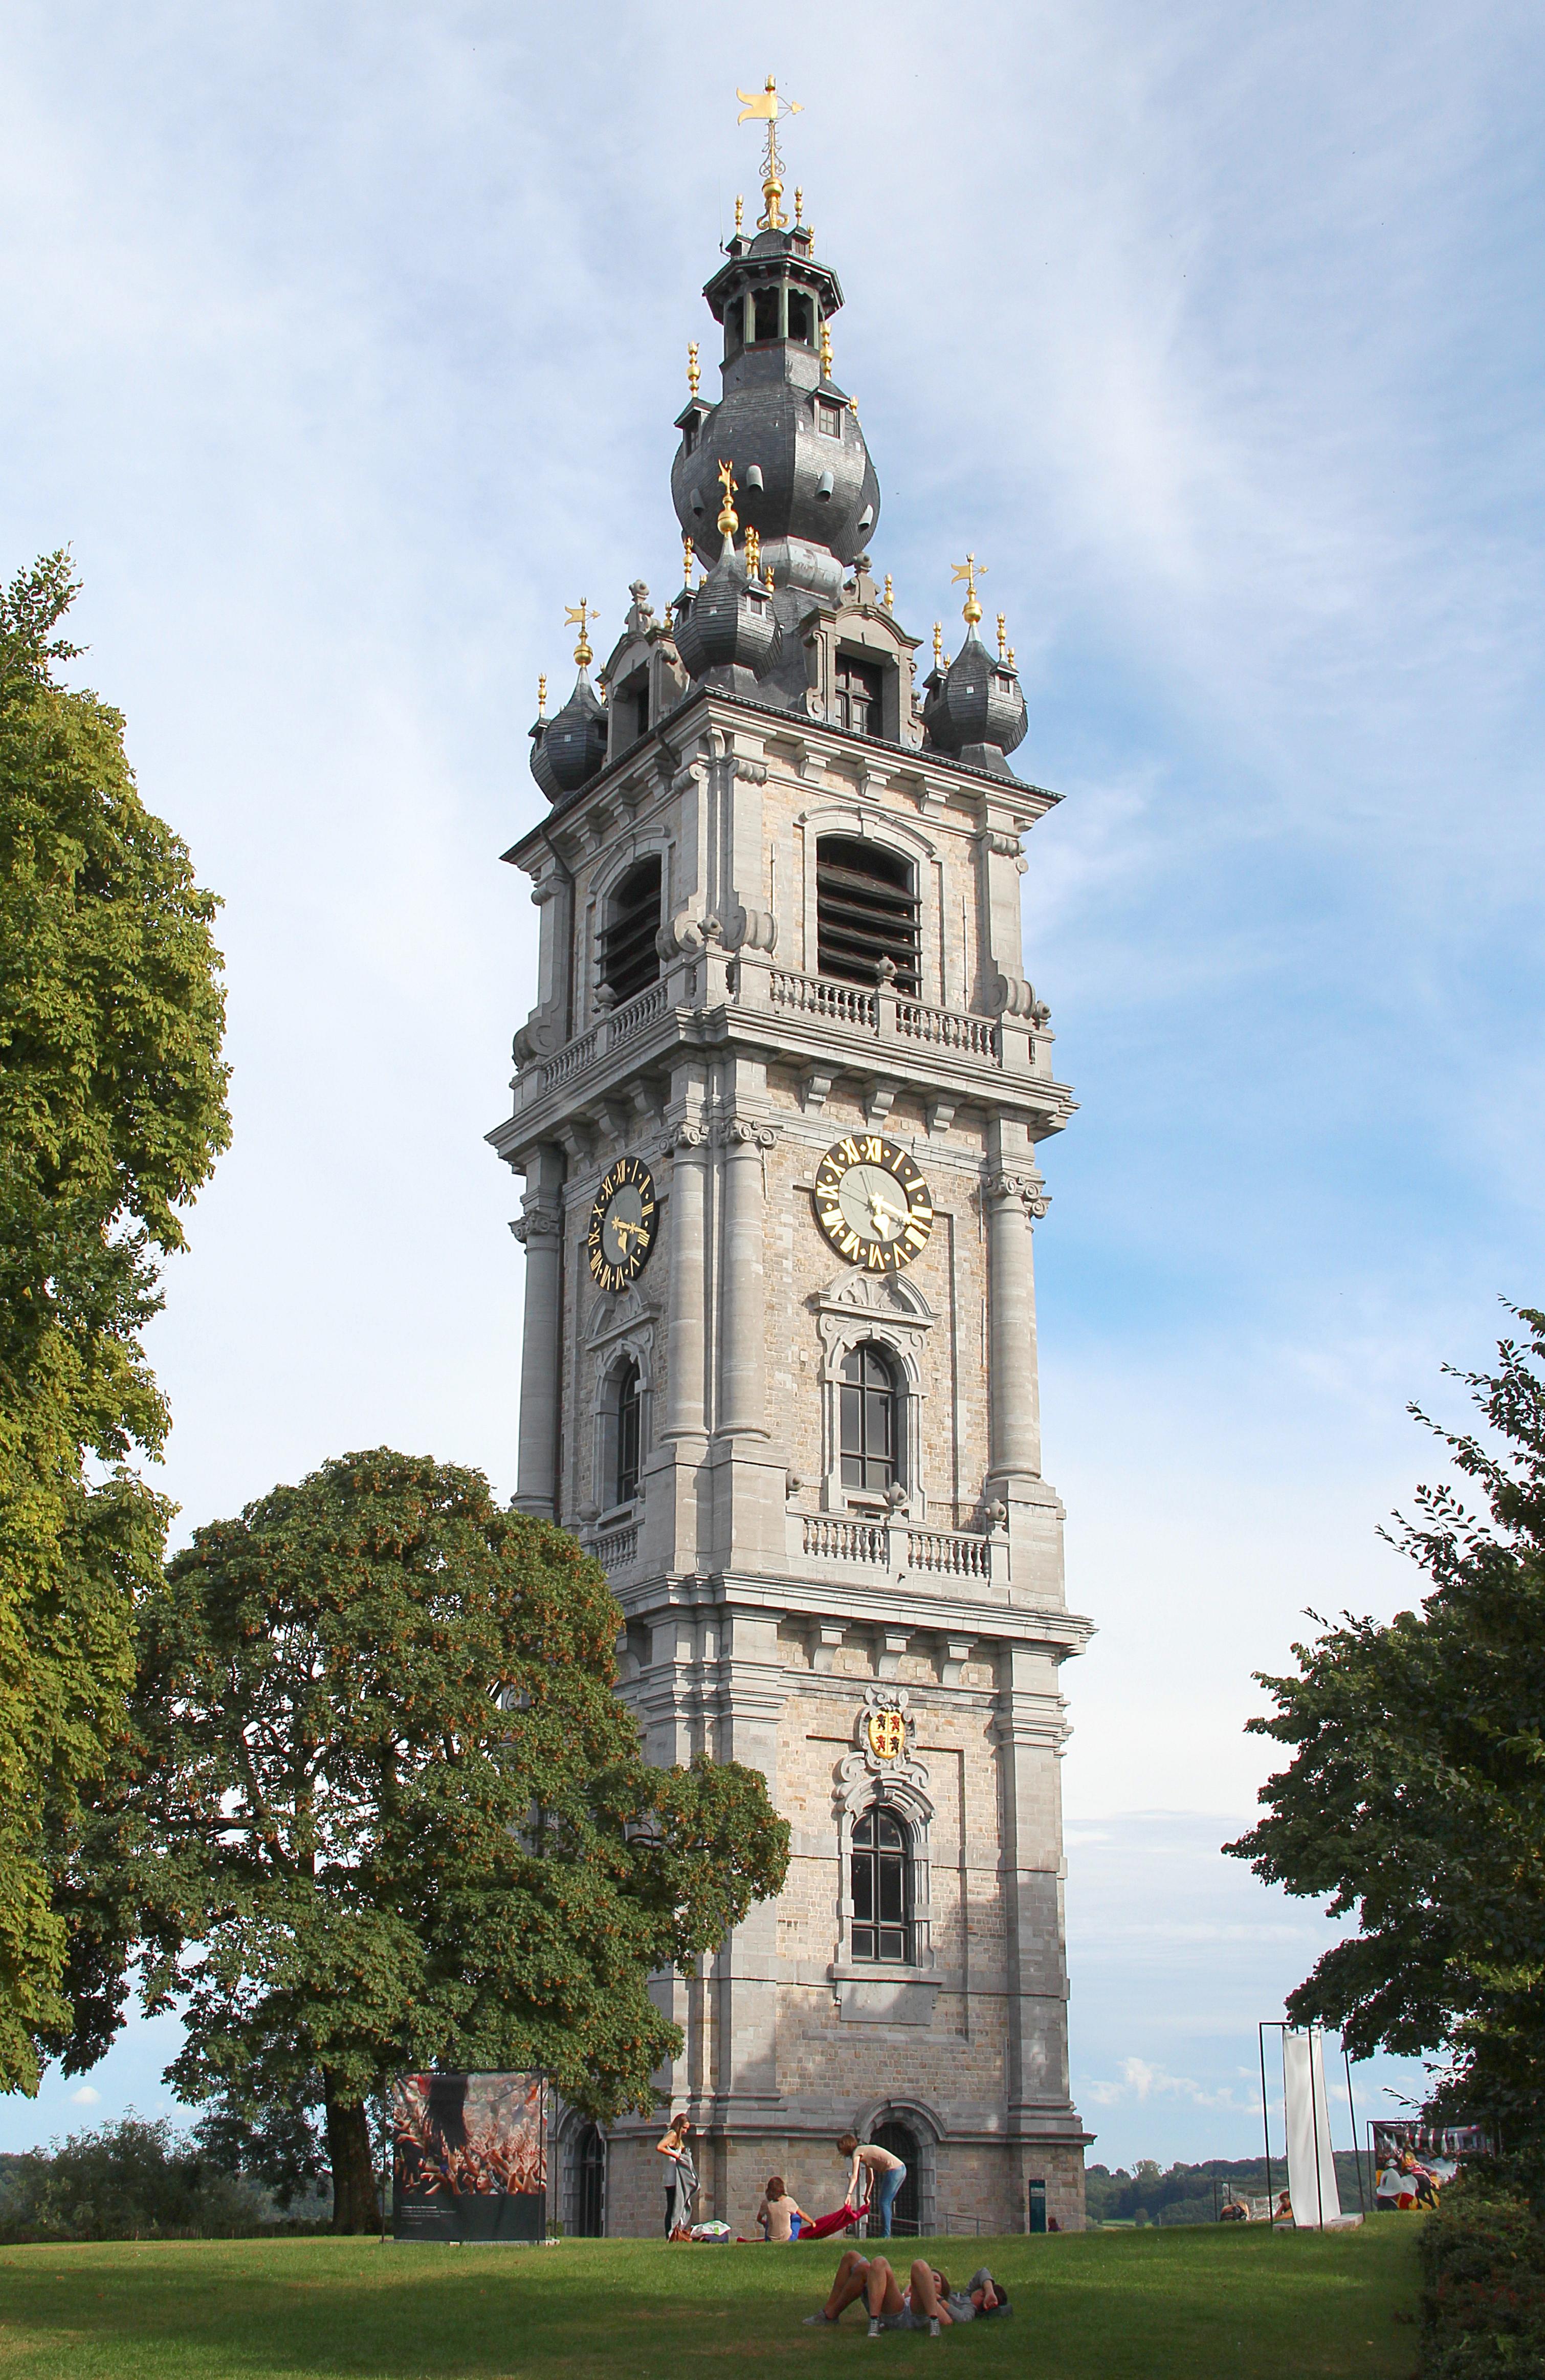 File:0 Mons - Beffroi (1).JPG - Wikimedia Commons